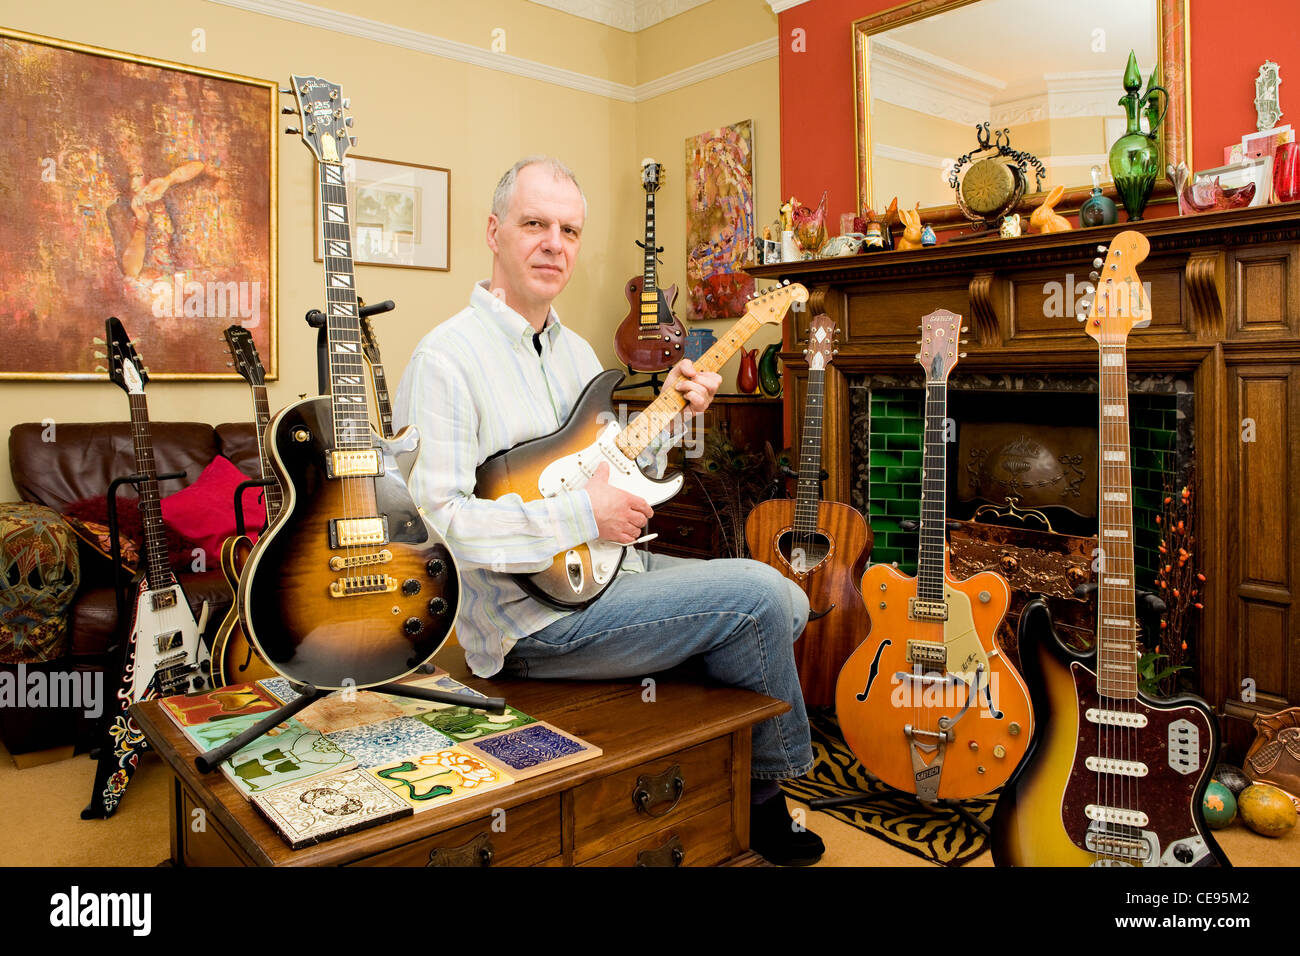 David Brewis of Rock Stars Guitars at